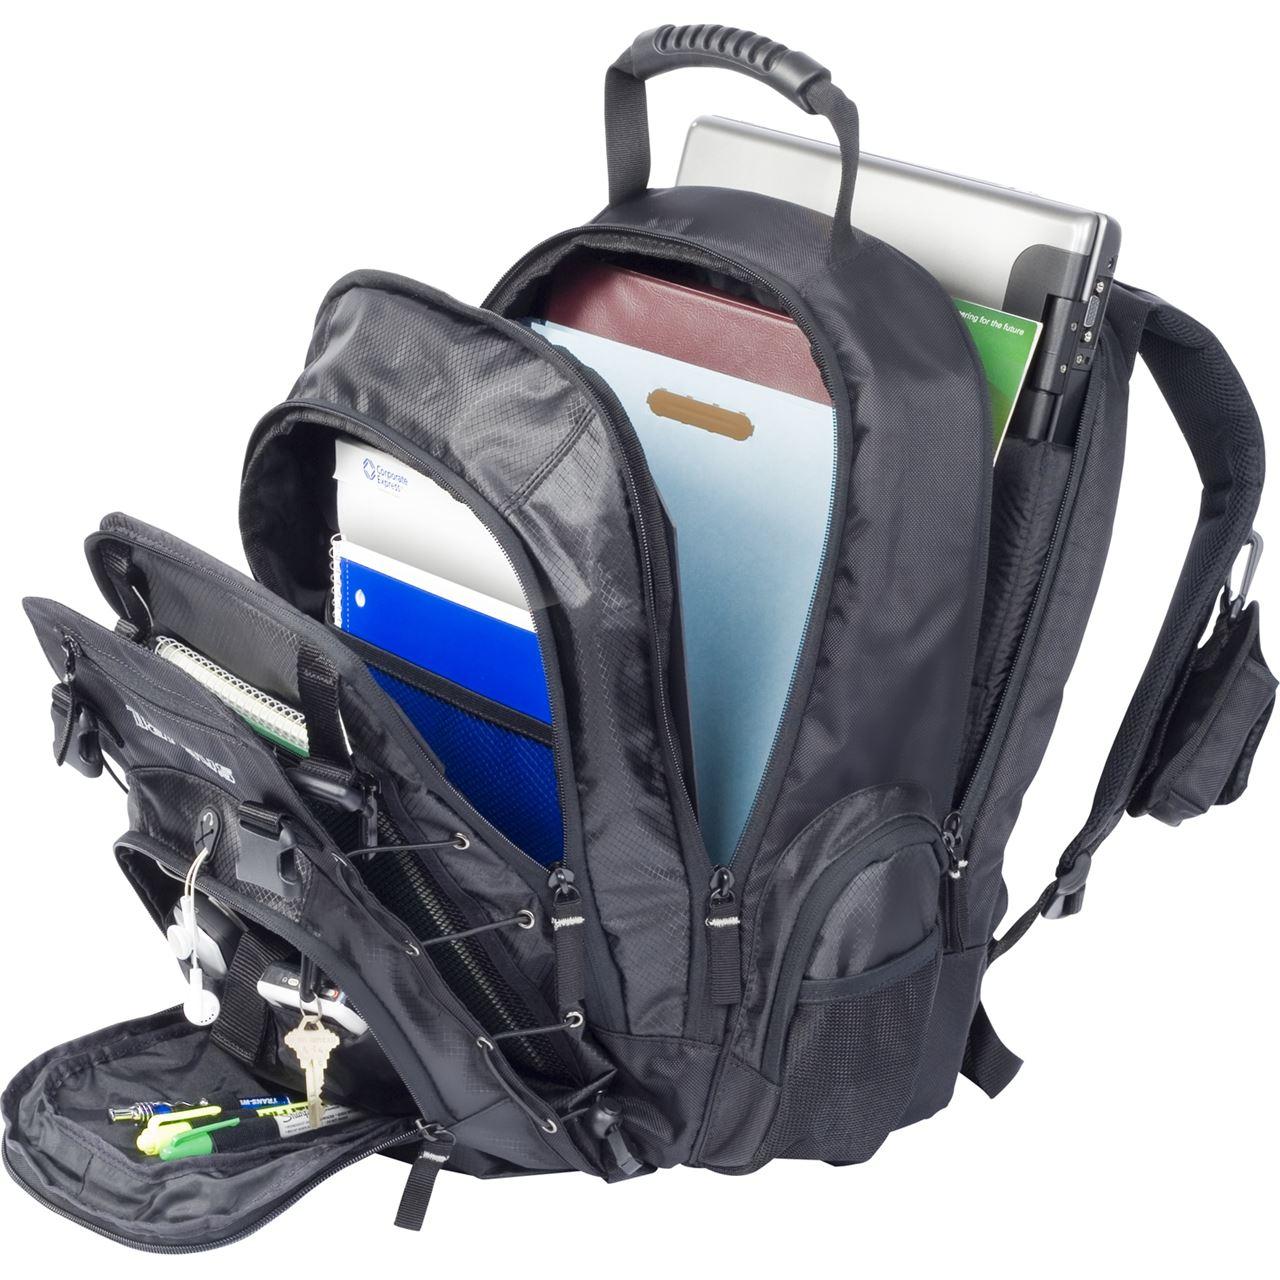 "15.4"" M1000 Laptop Backpack - RG0322 - Black: Backpacks: Targus"